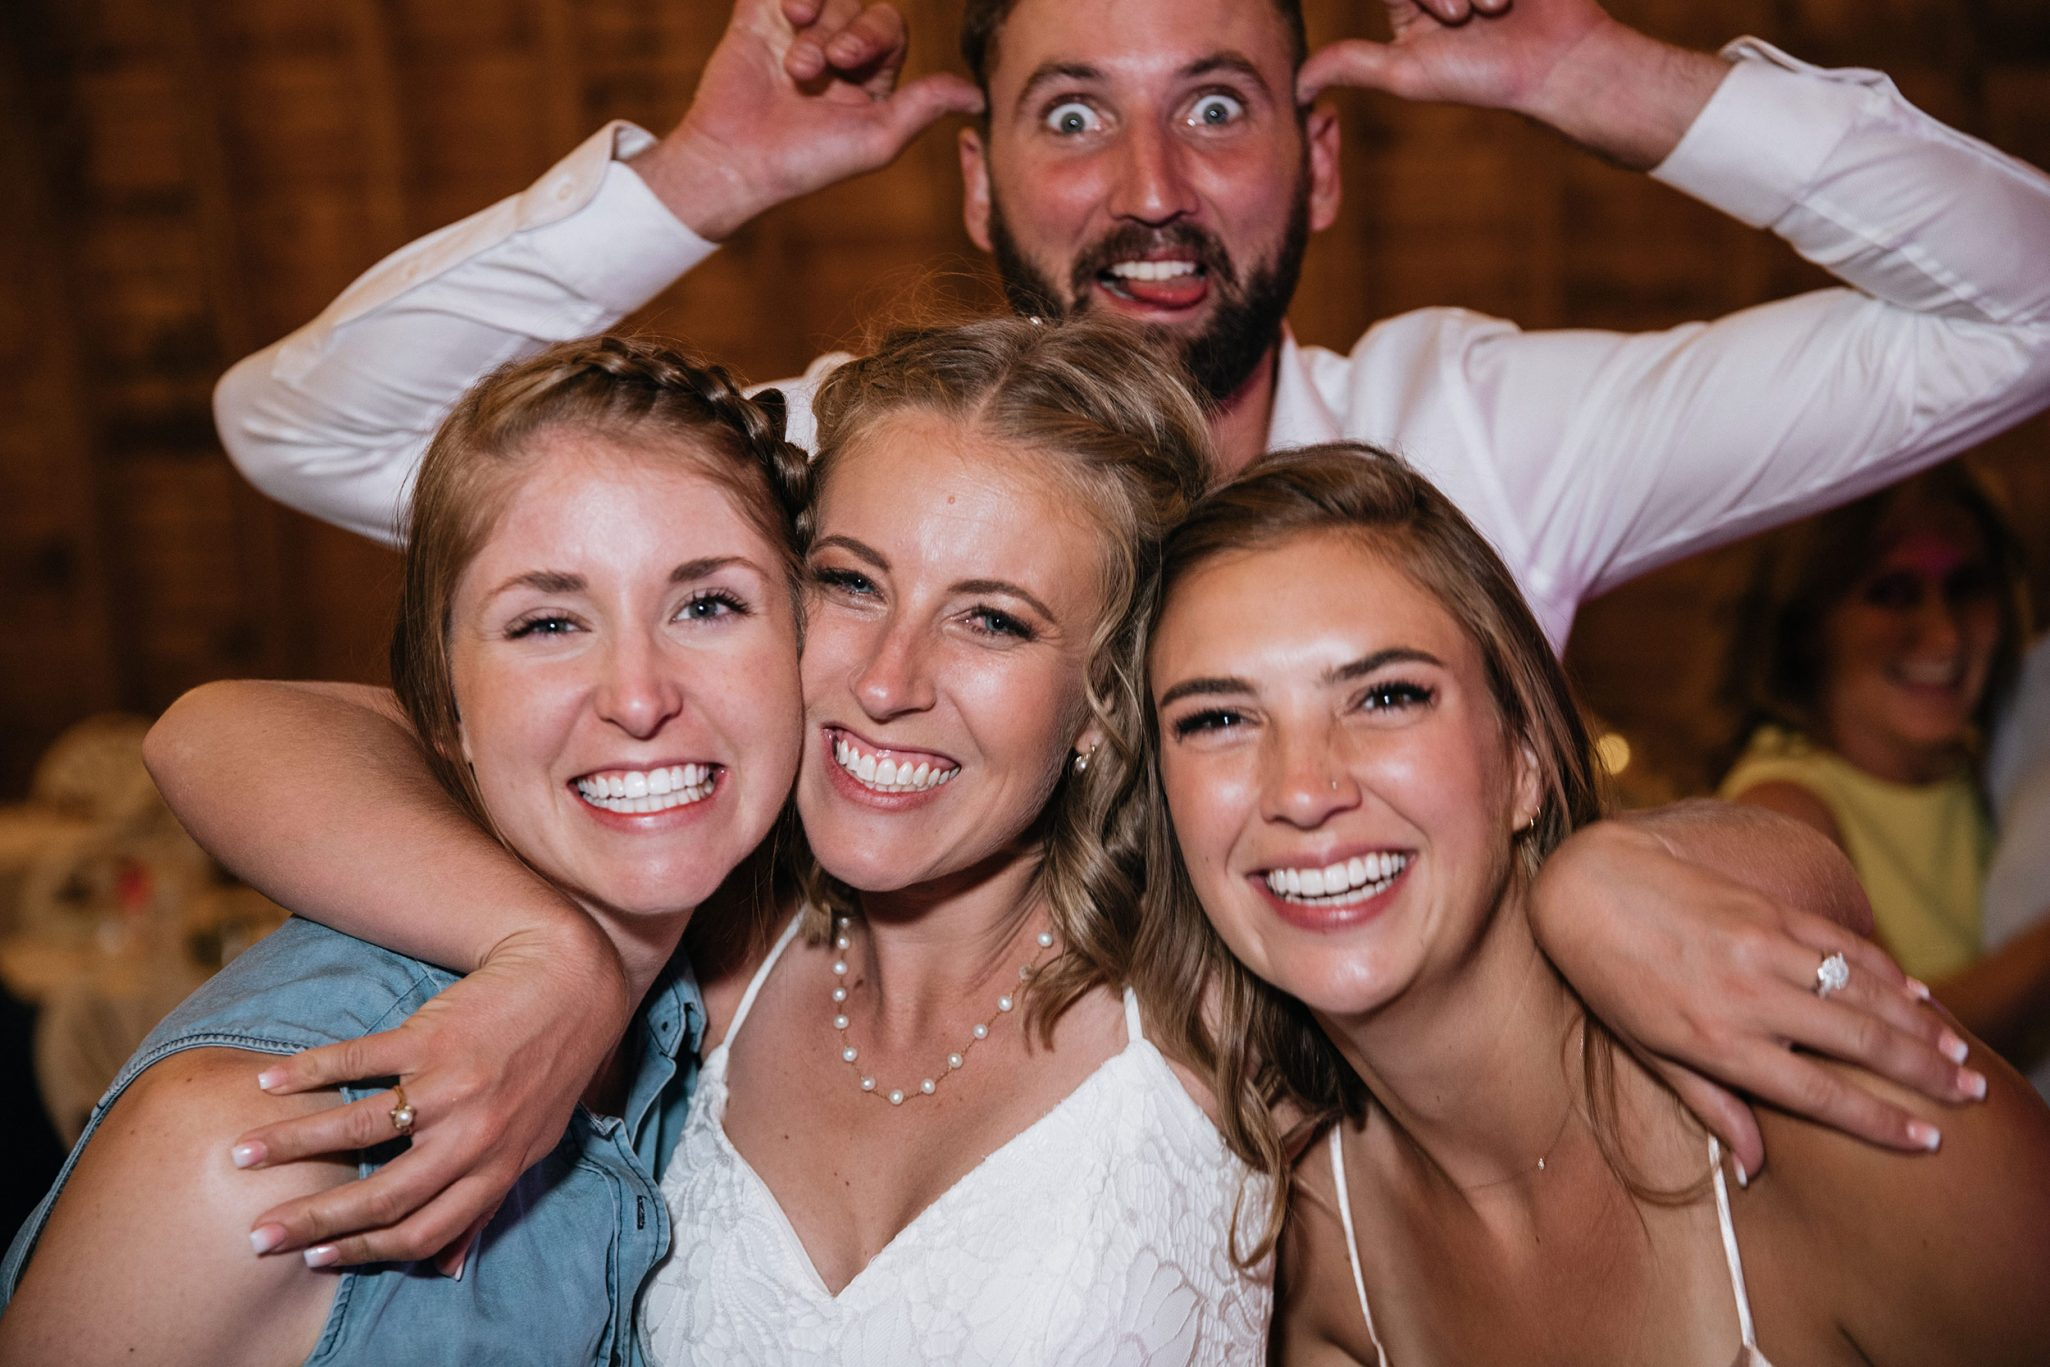 Wedding Reception photo booth fun at Reising Stage, Durango Colorado